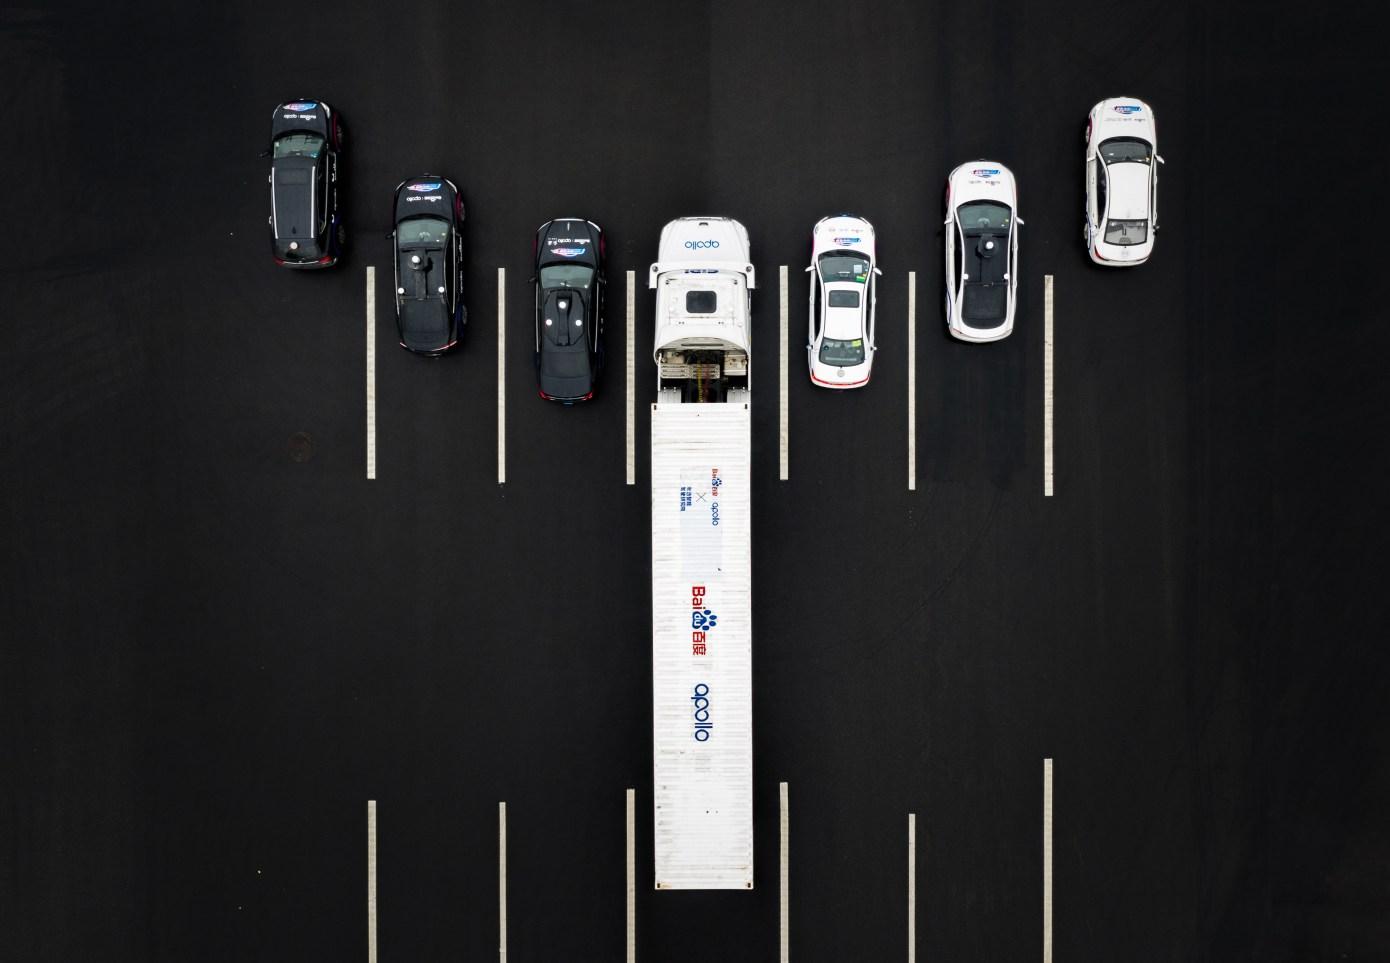 Baidu Fahrzeuge